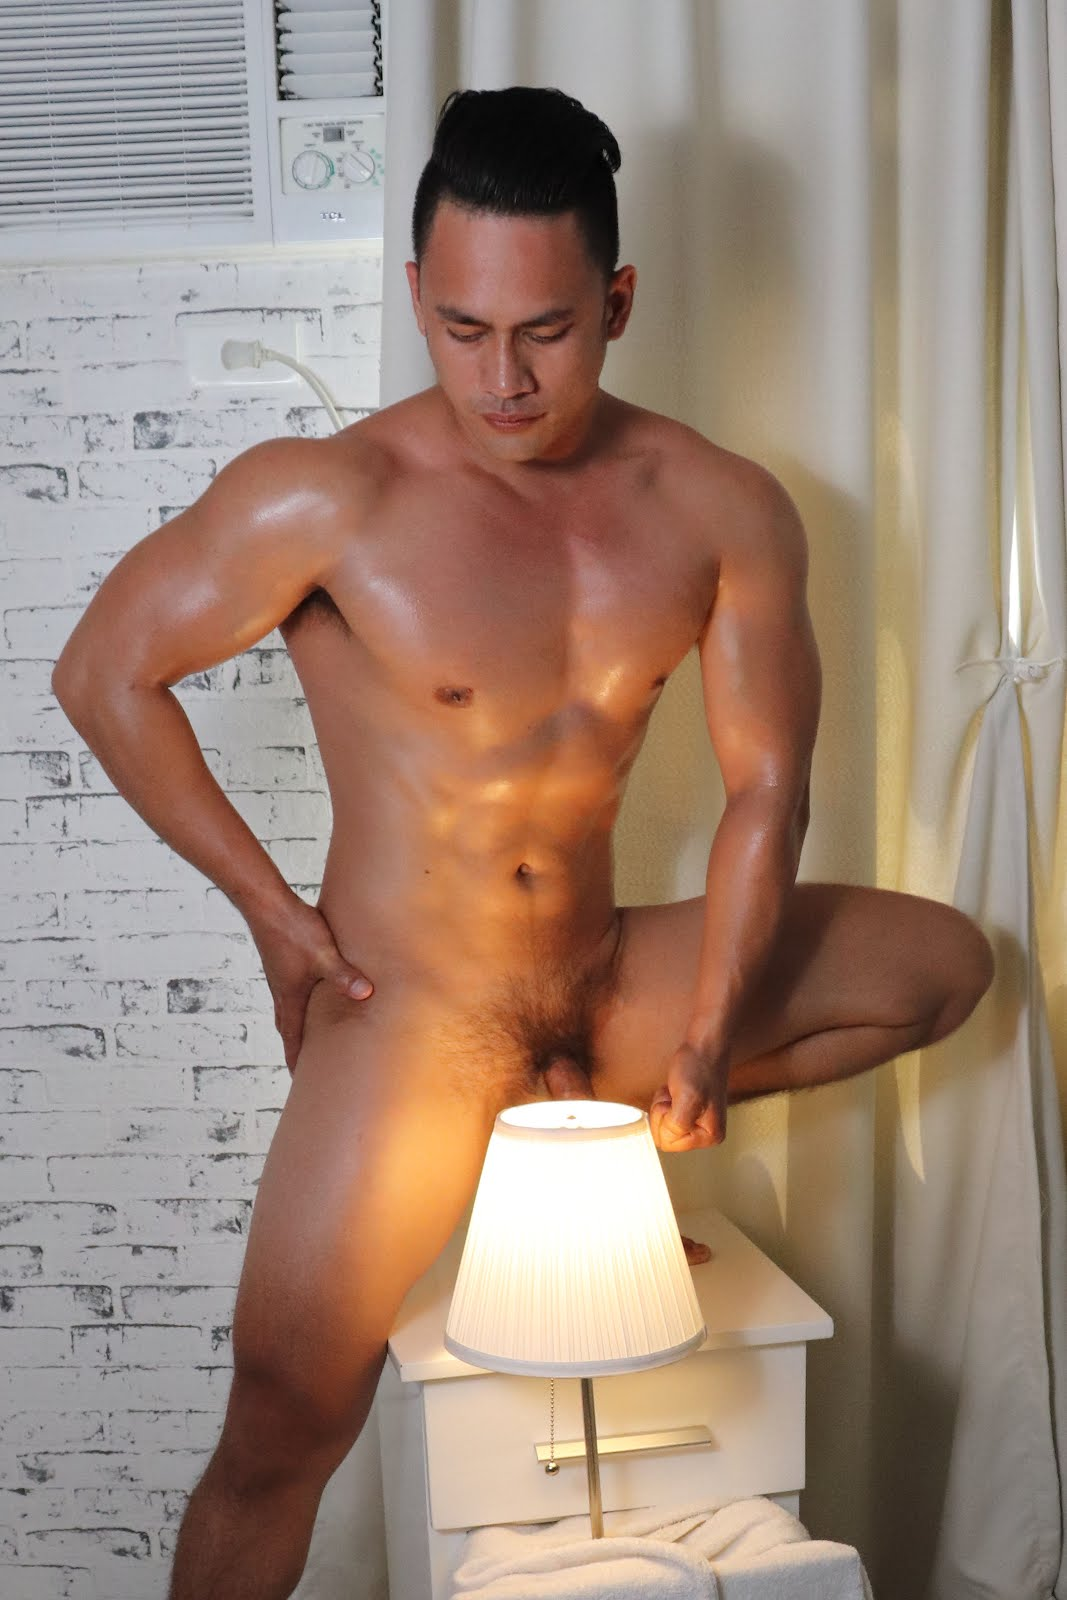 Gay escort fort lauderdale